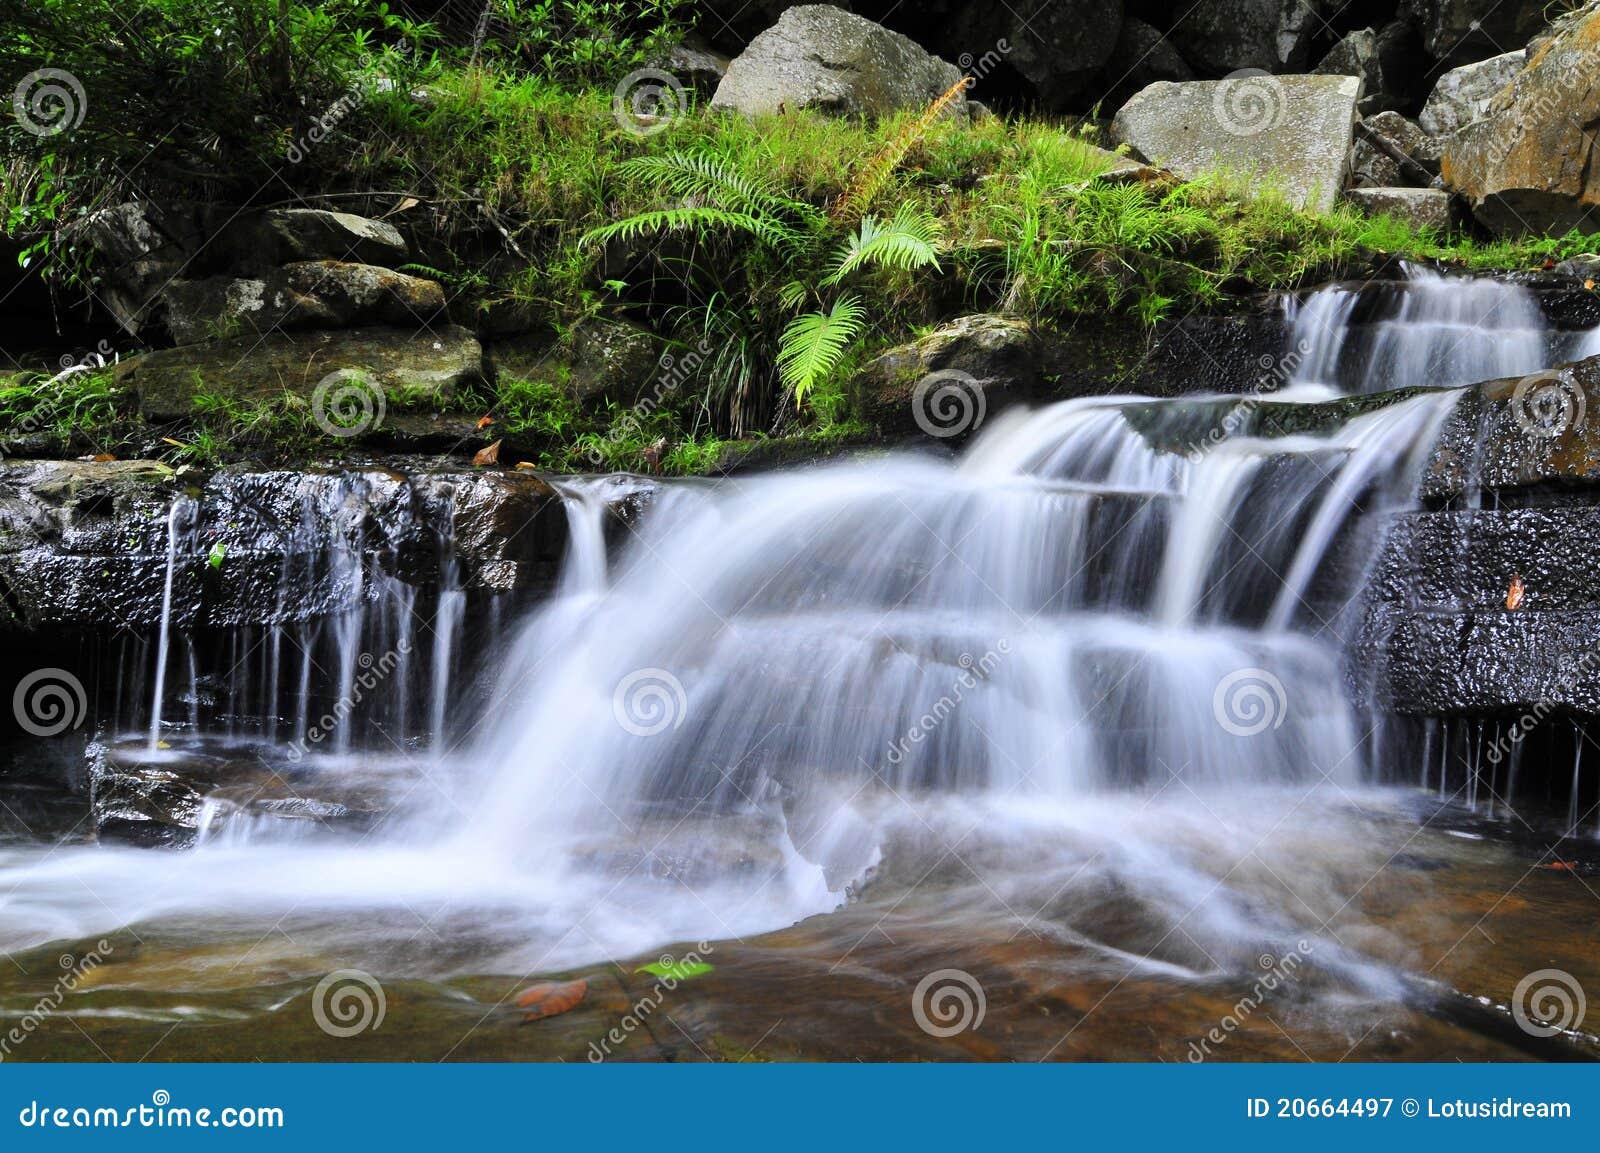 beautiful soft waterfall in - photo #2